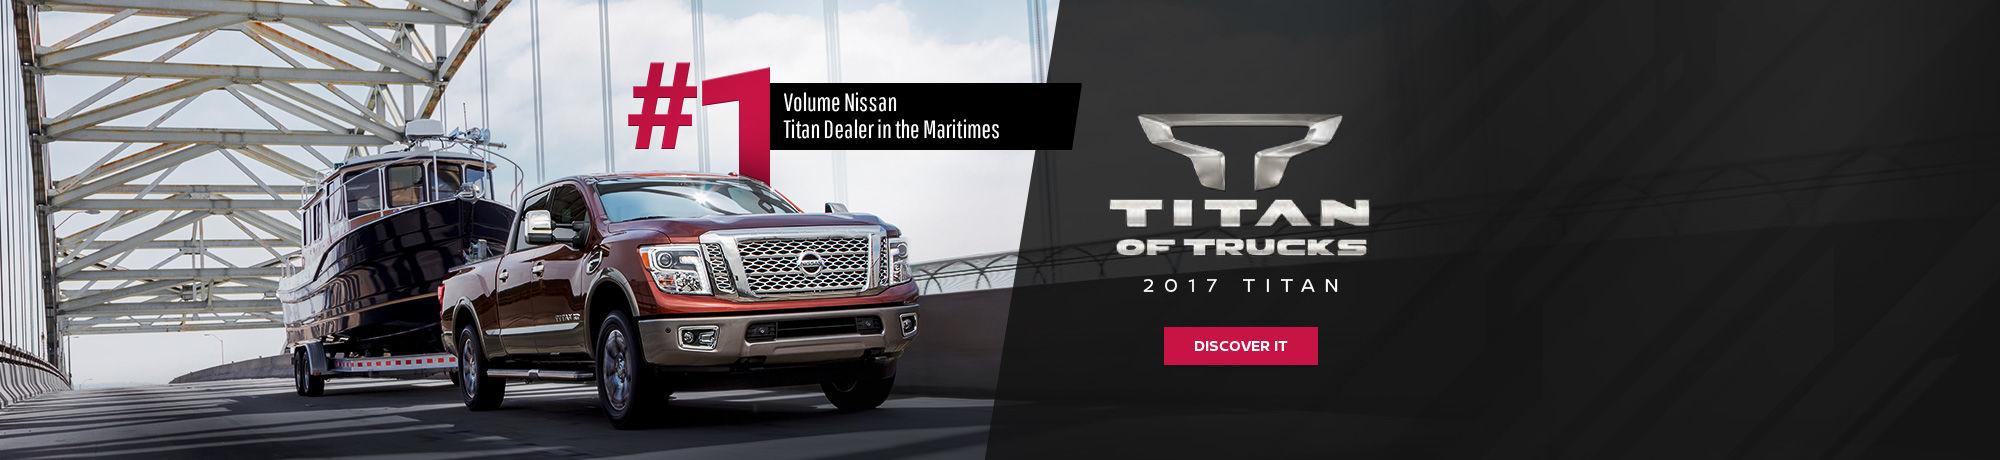 2017 Titan